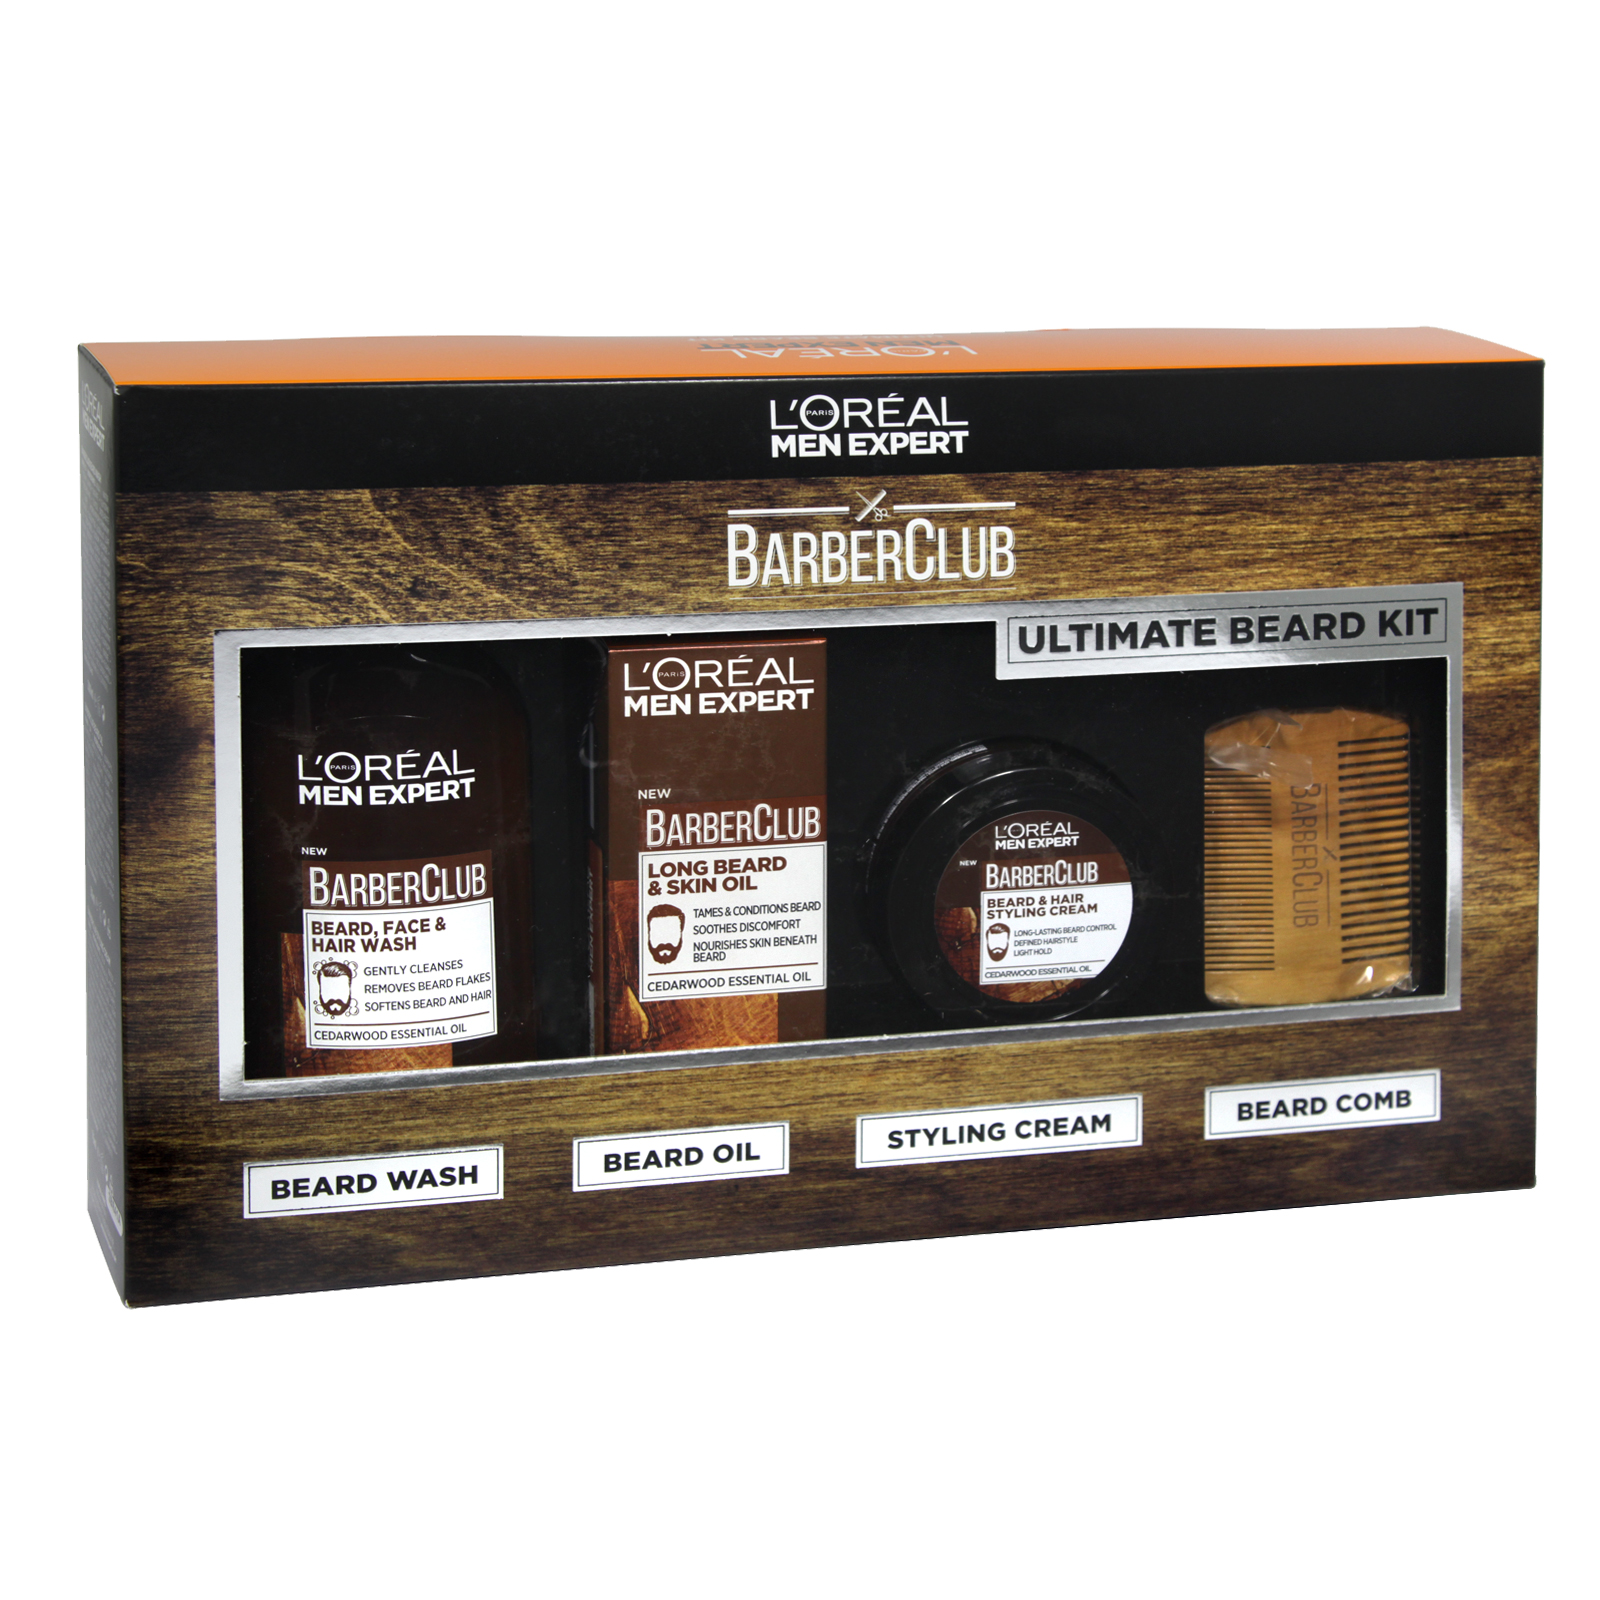 LOREAL MEN EXPERT BARBER CLUB 30ML BEARD OIL+75ML B/CREAM+200ML B/WASH+B/COMB